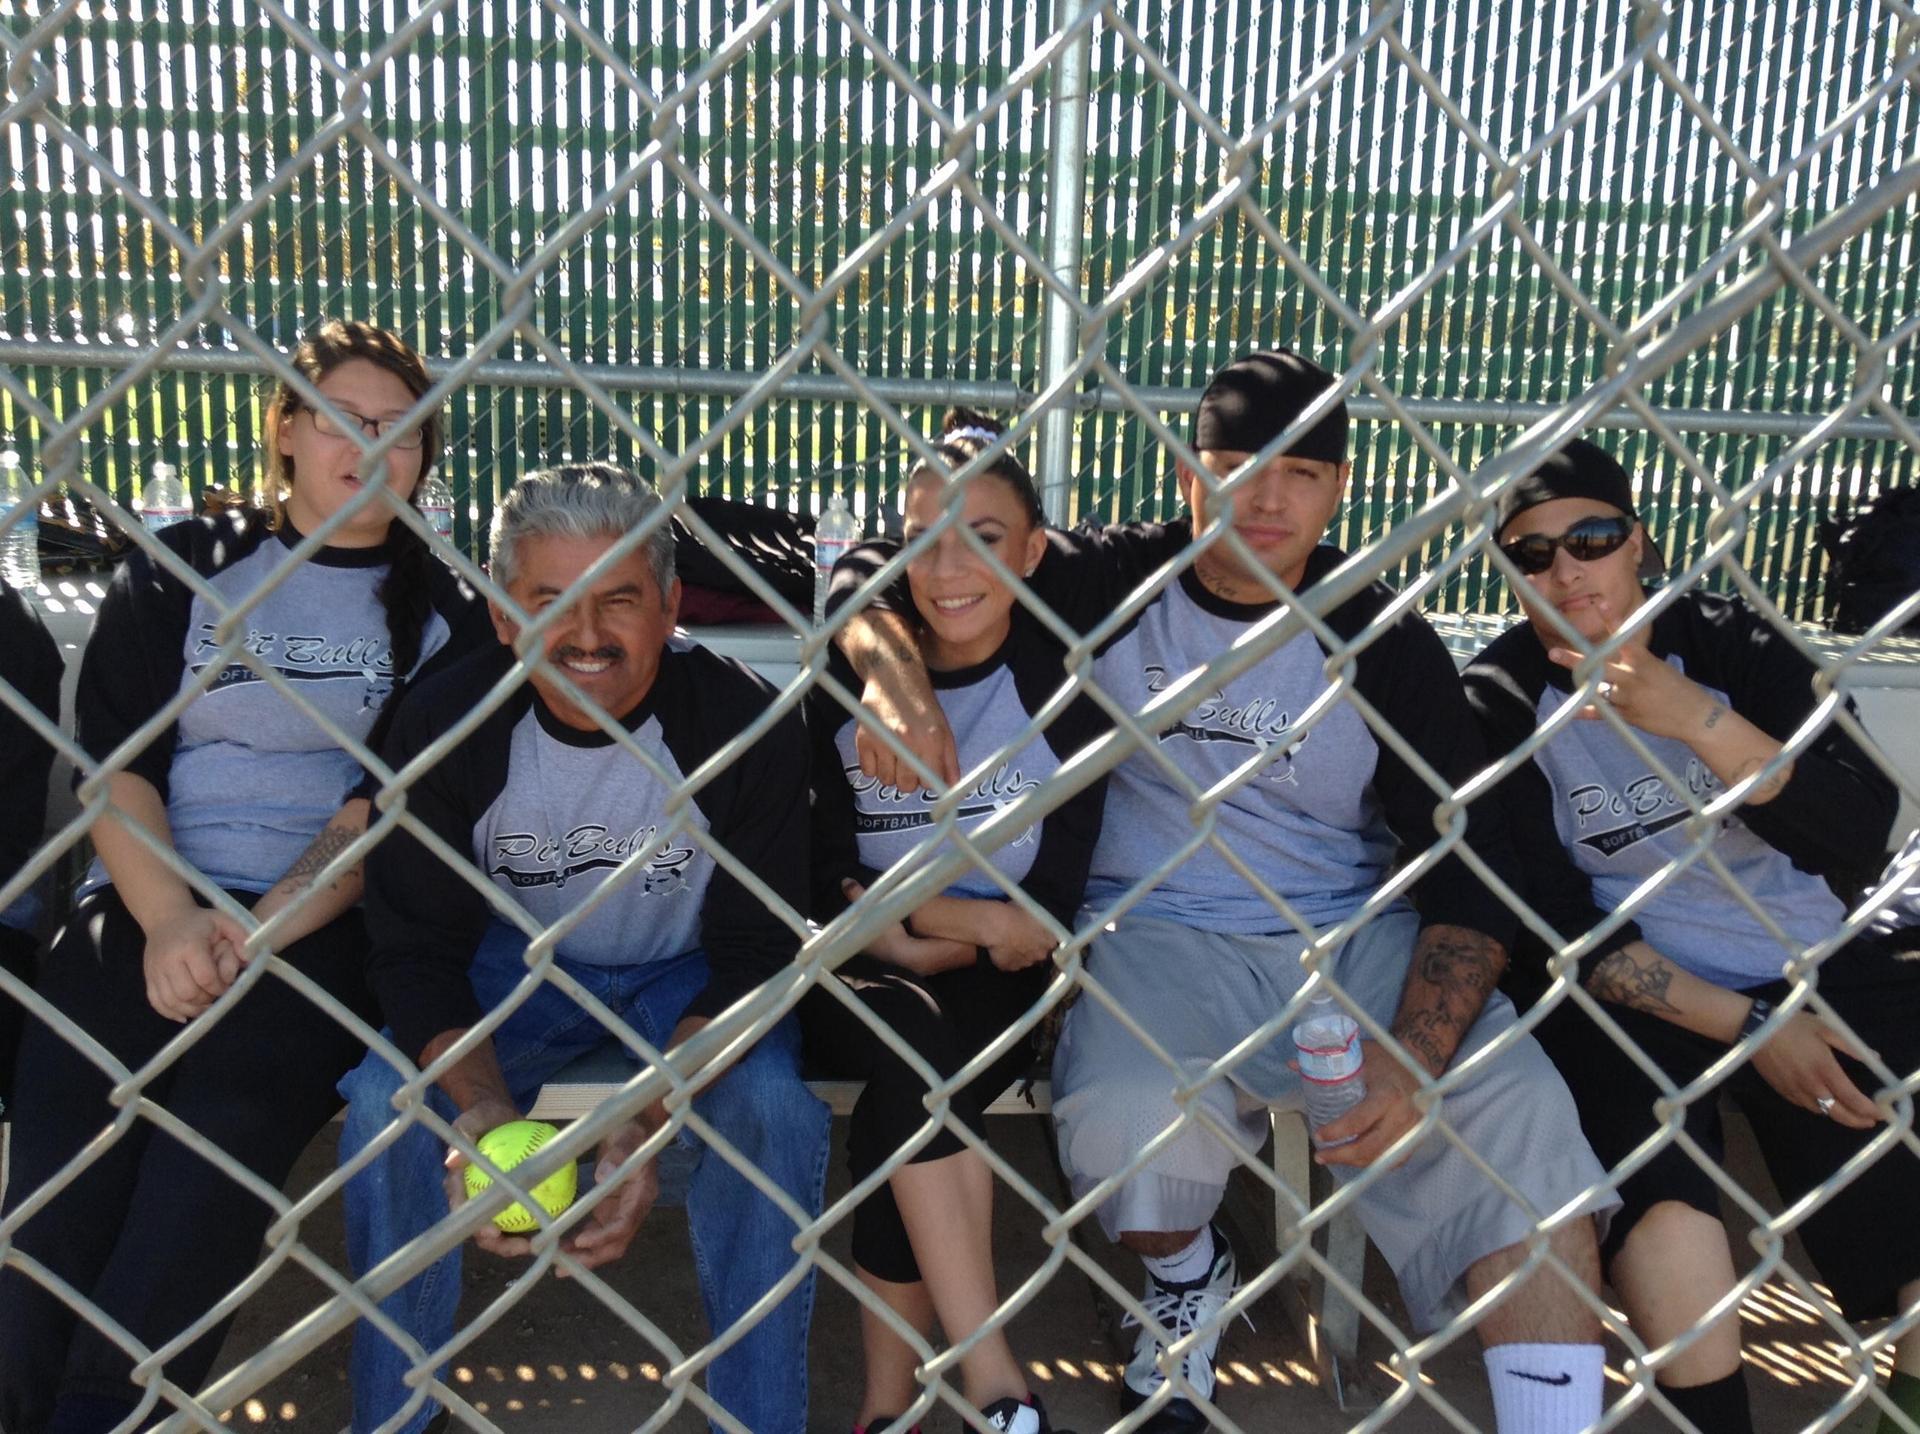 AVYB softball tournament